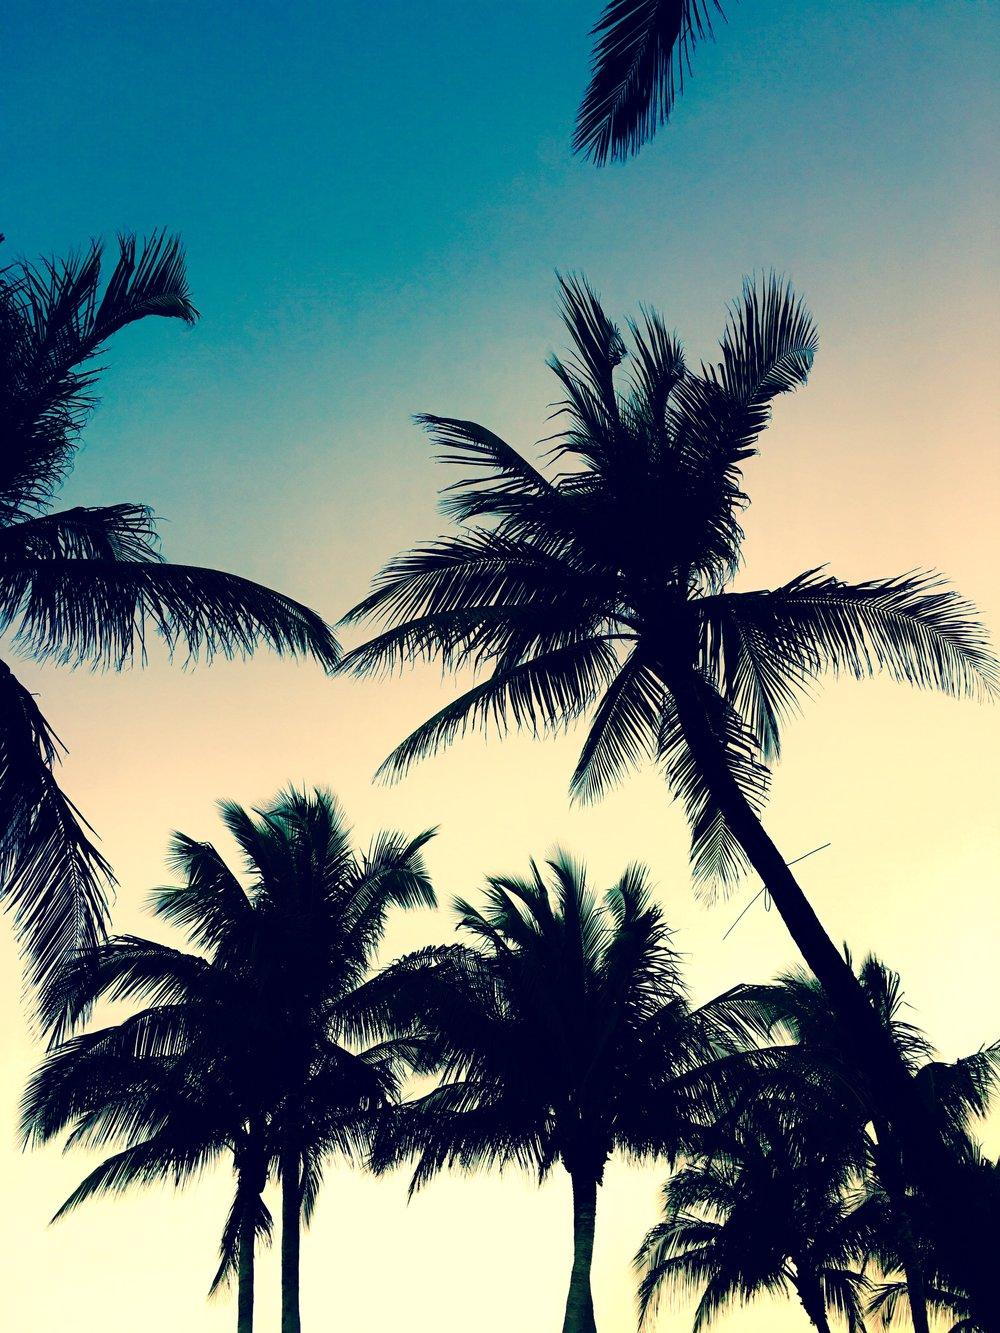 Miami Palm Trees - photography